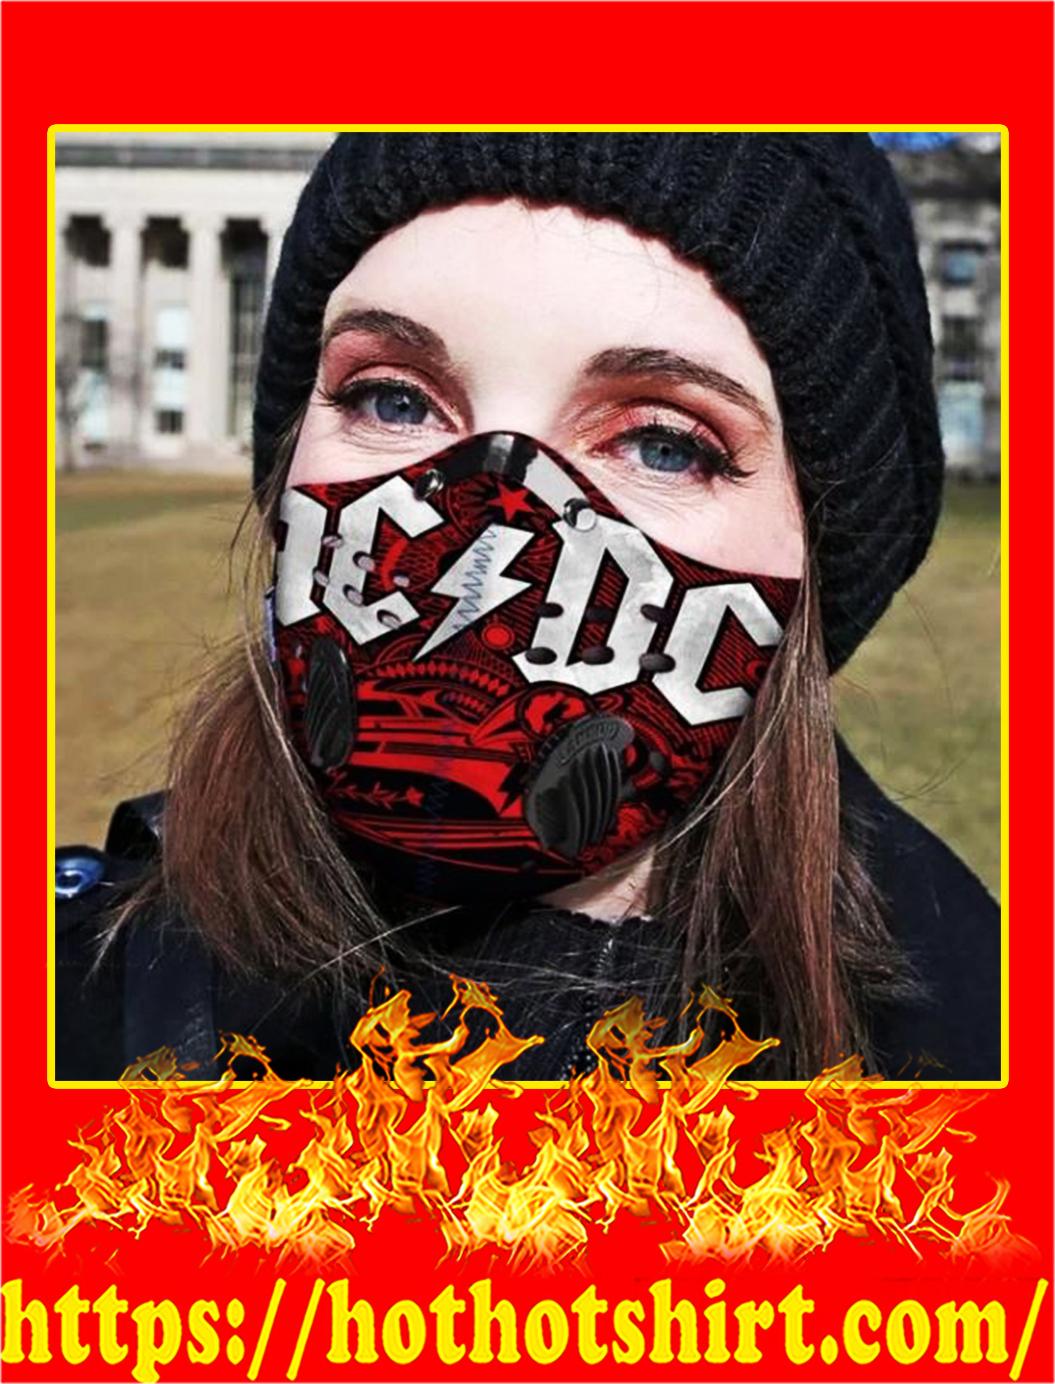 AC-DC POD face mask - pic 1